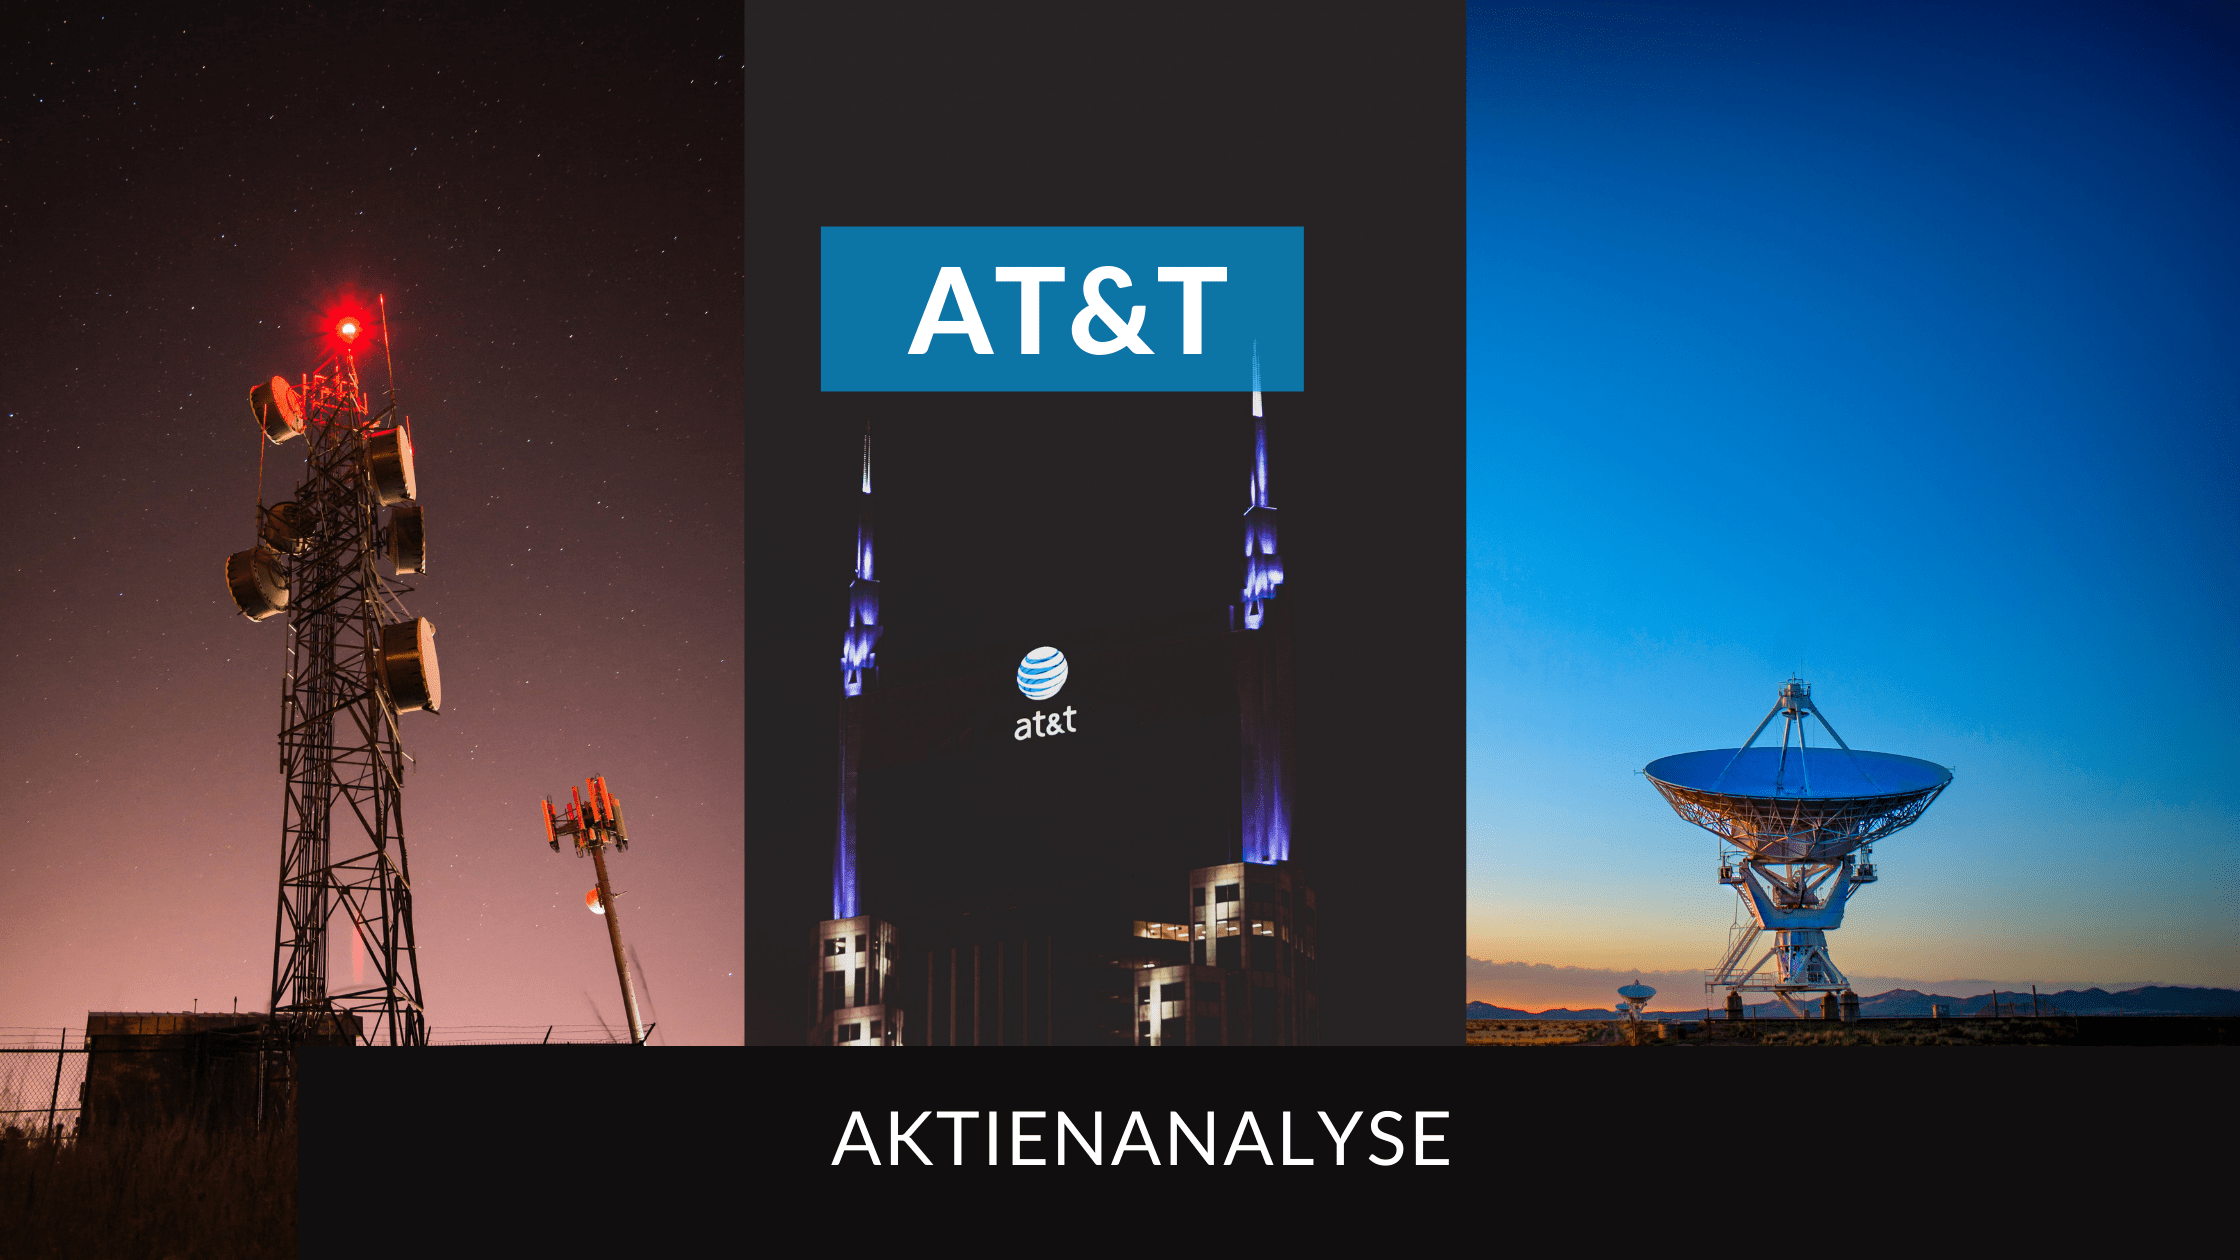 AT&T Aktienanalyse